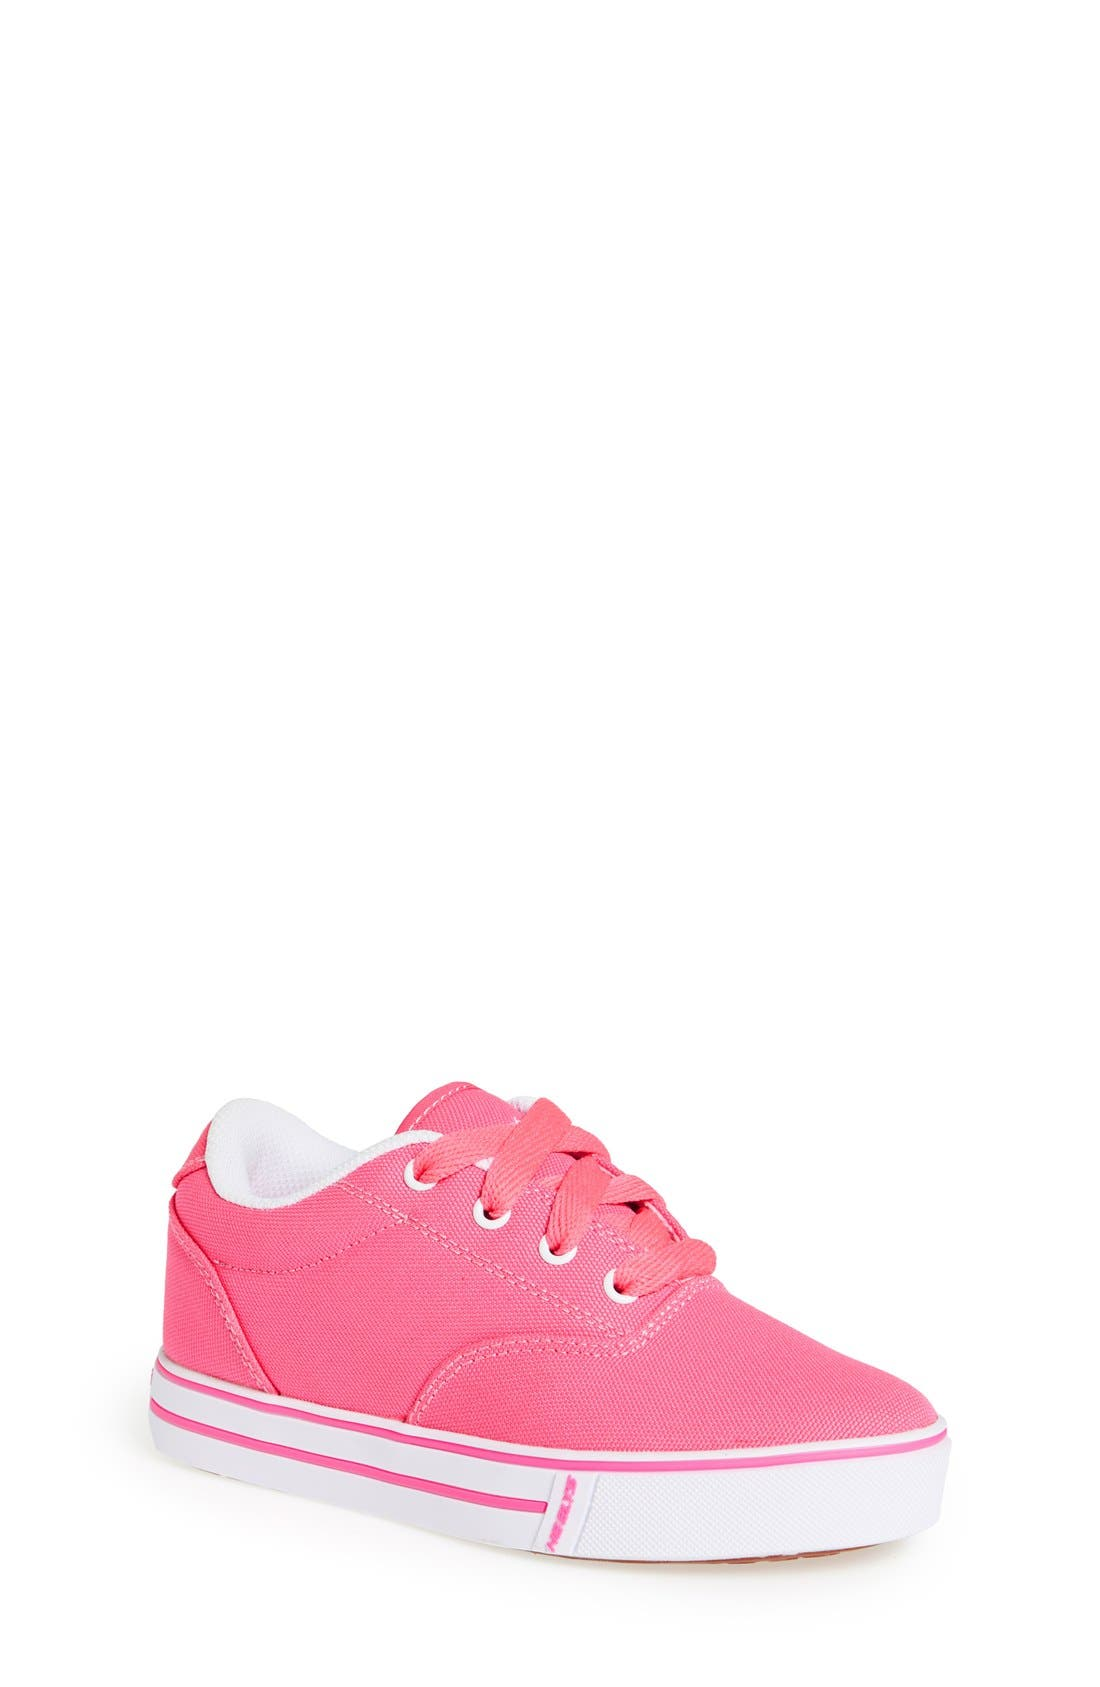 Main Image - Heelys 'Launch' Canvas Sneaker (Little Kid & Big Kid)